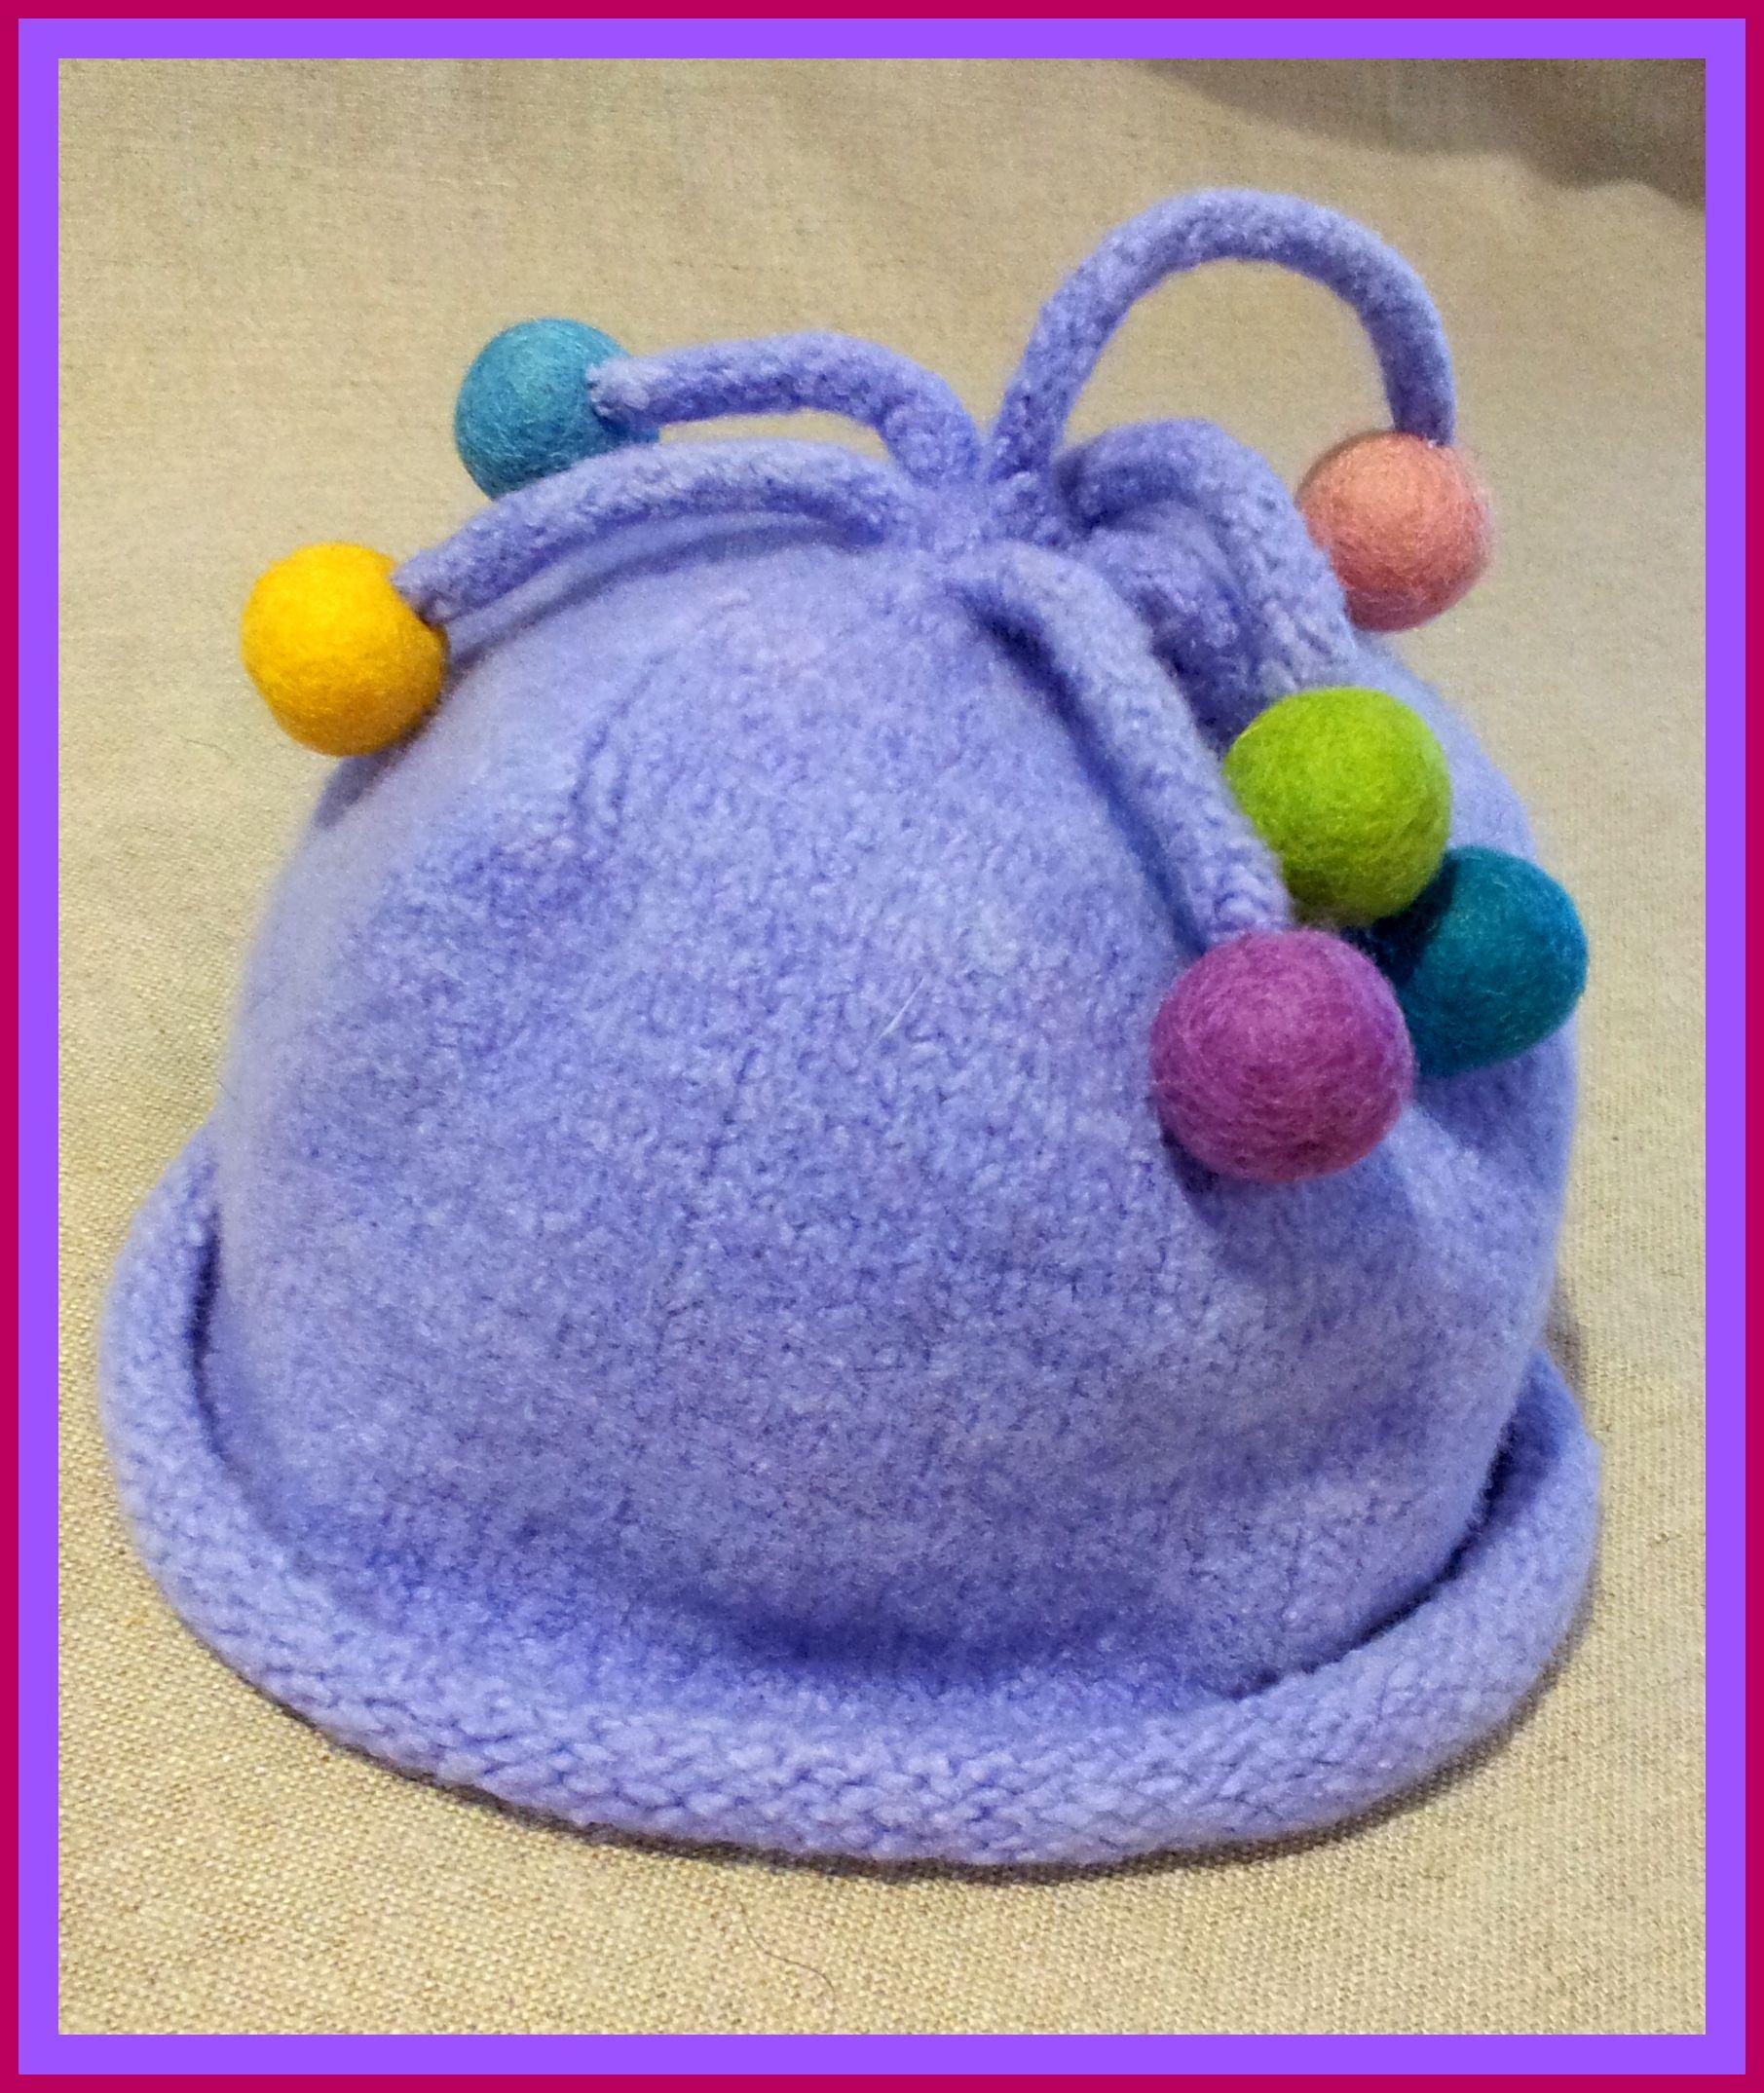 a82040c9851 Malabrigo felted baby hat kit! Wow